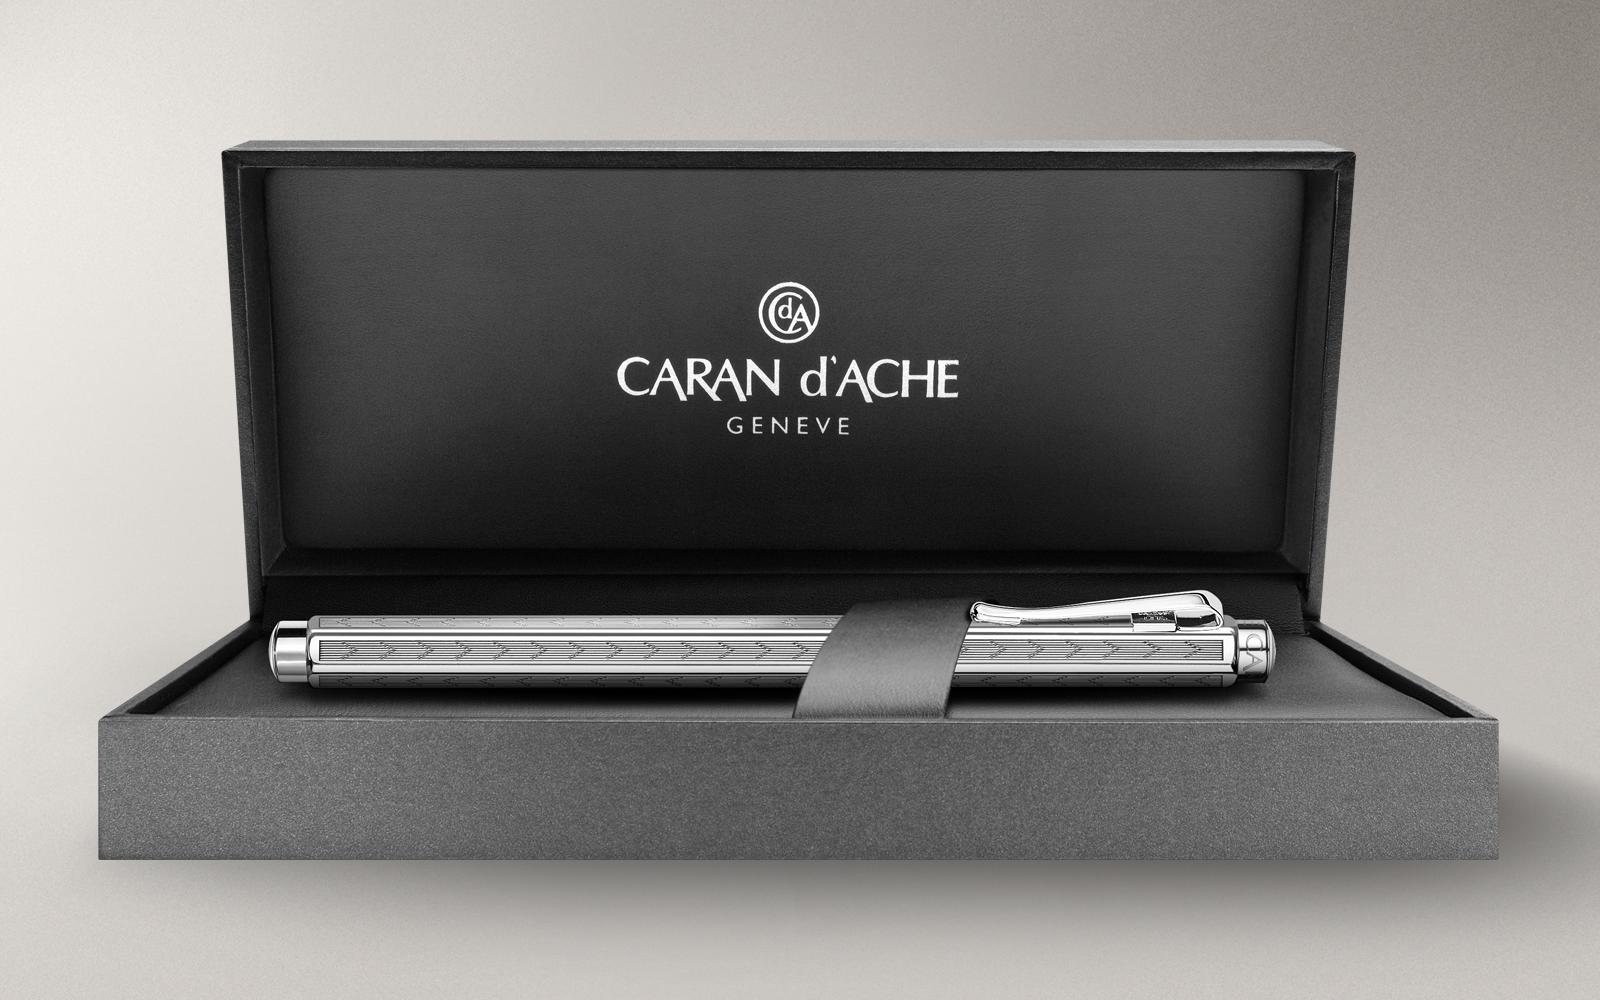 Carandache Ecridor - Chevron PC, шариковая ручка, F